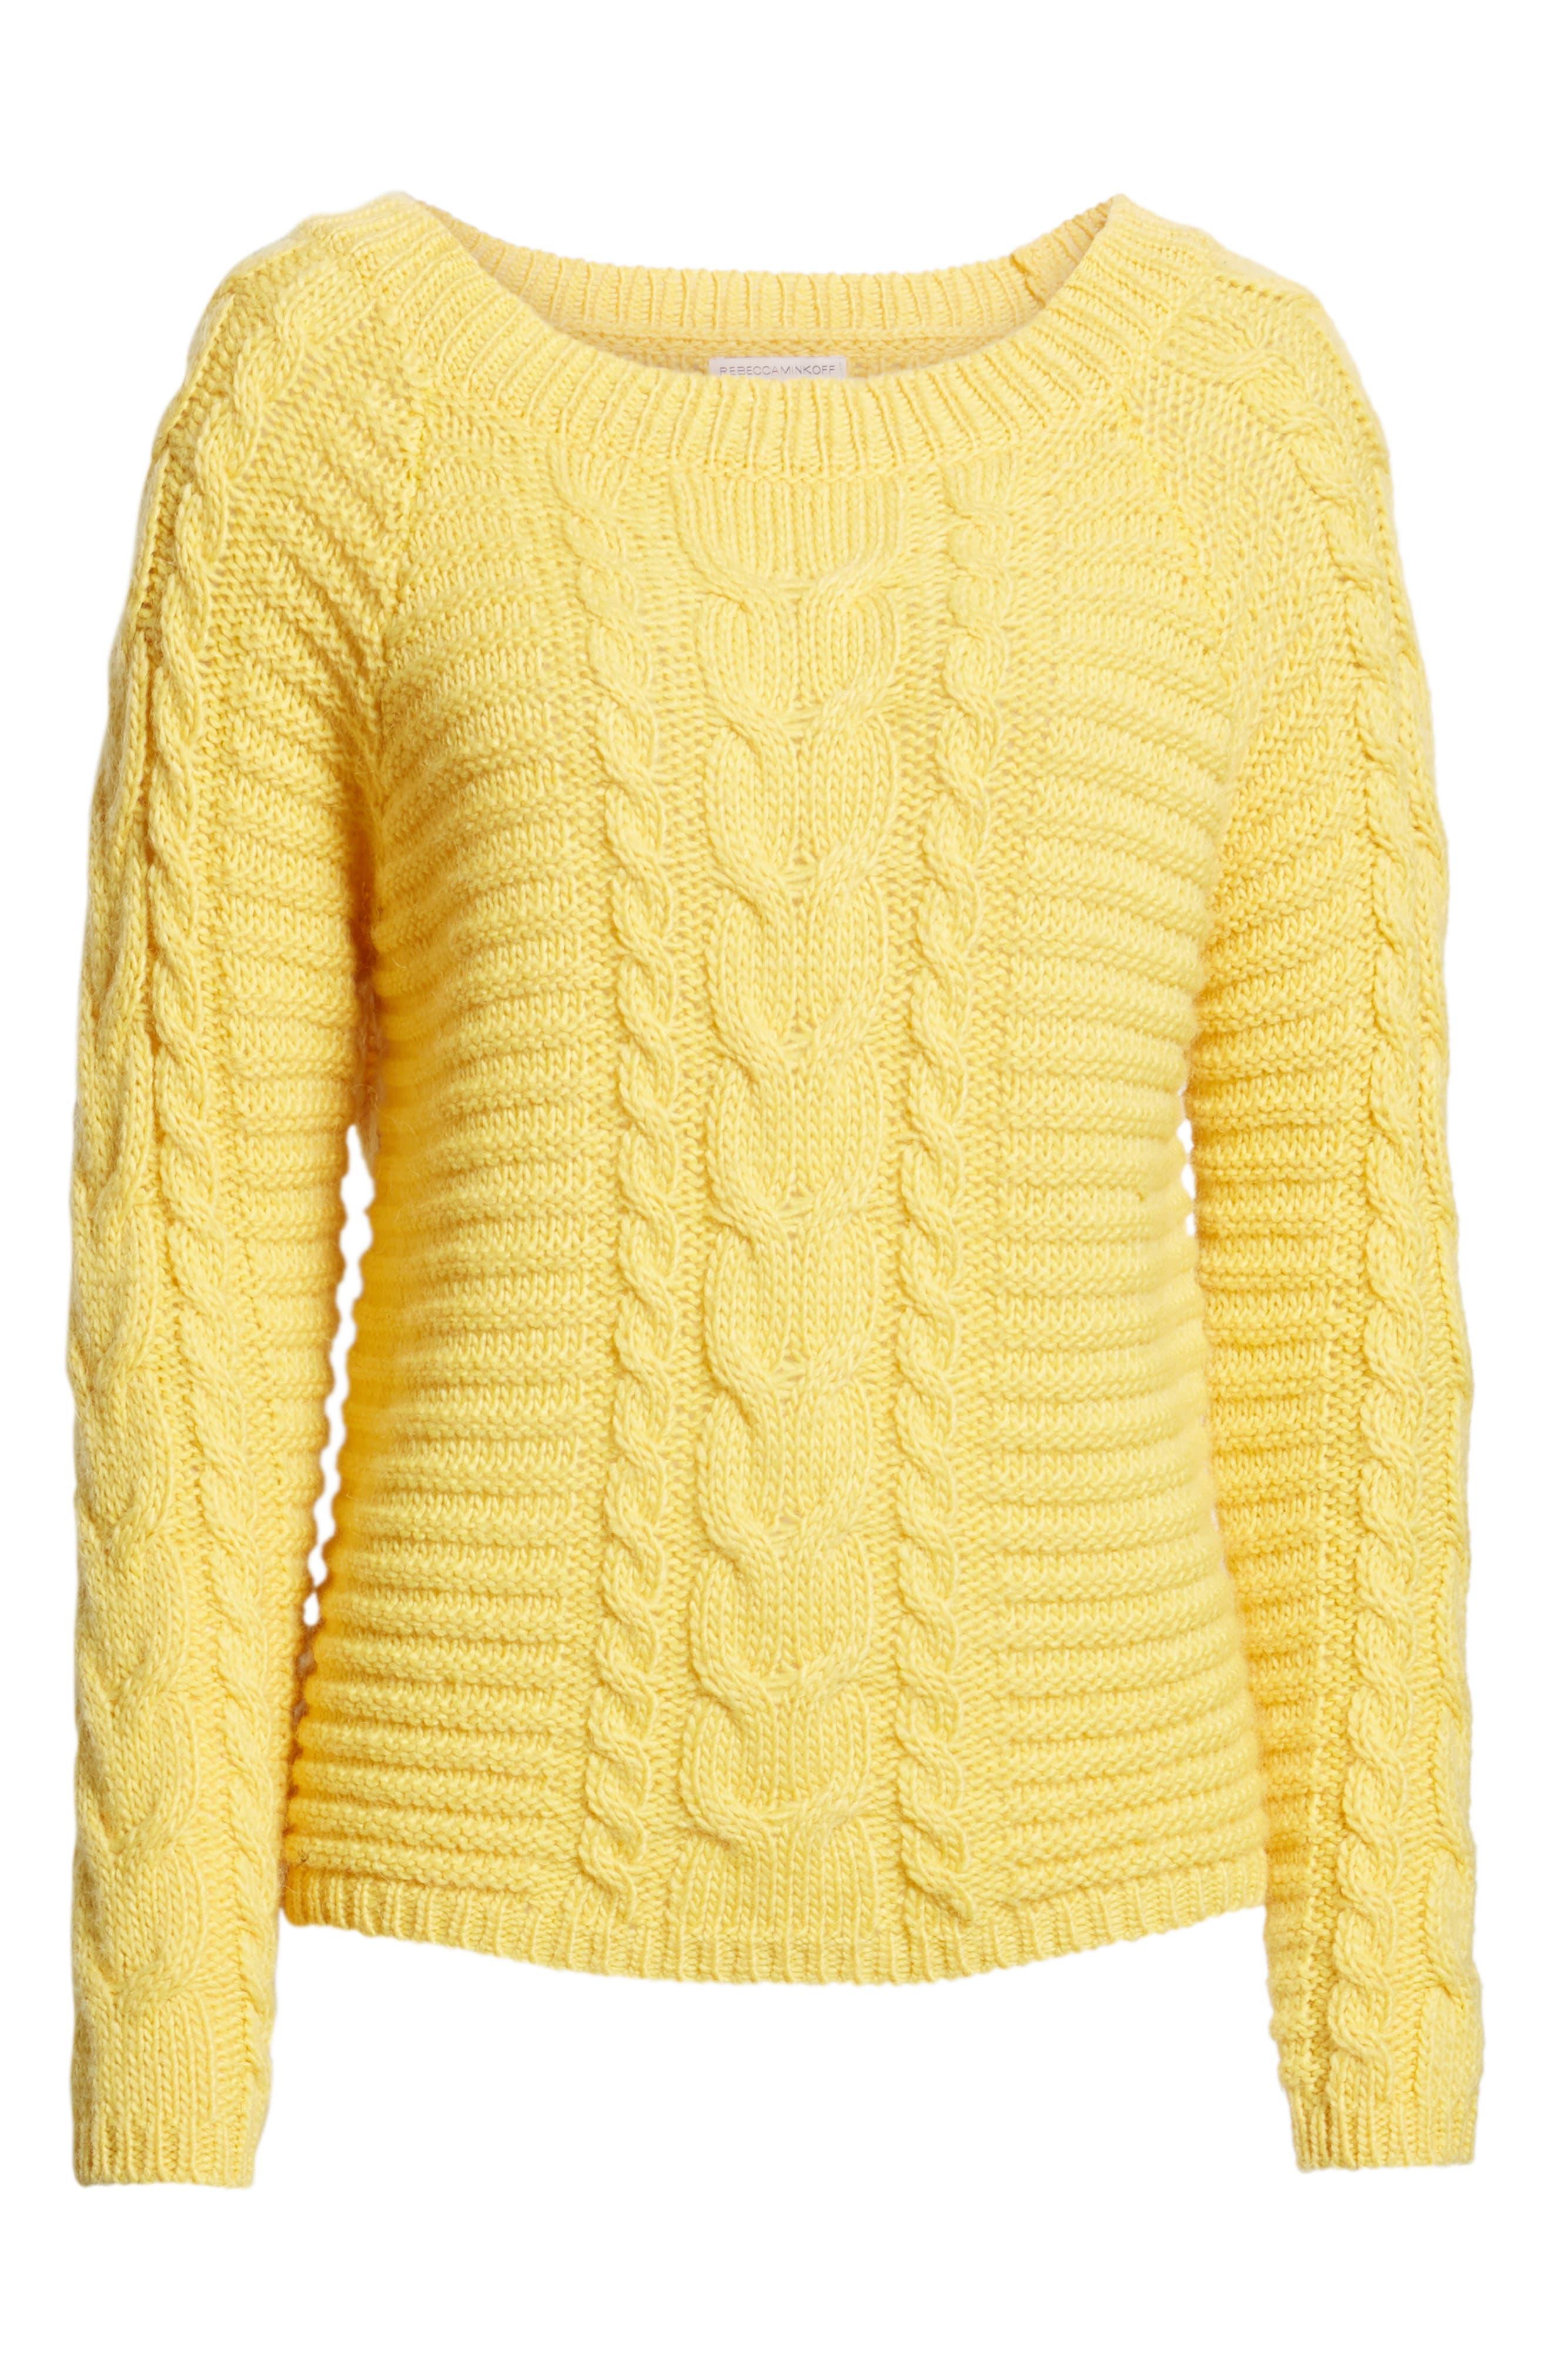 REBECCA MINKOFF,                             Juna Sweater,                             Alternate thumbnail 6, color,                             700